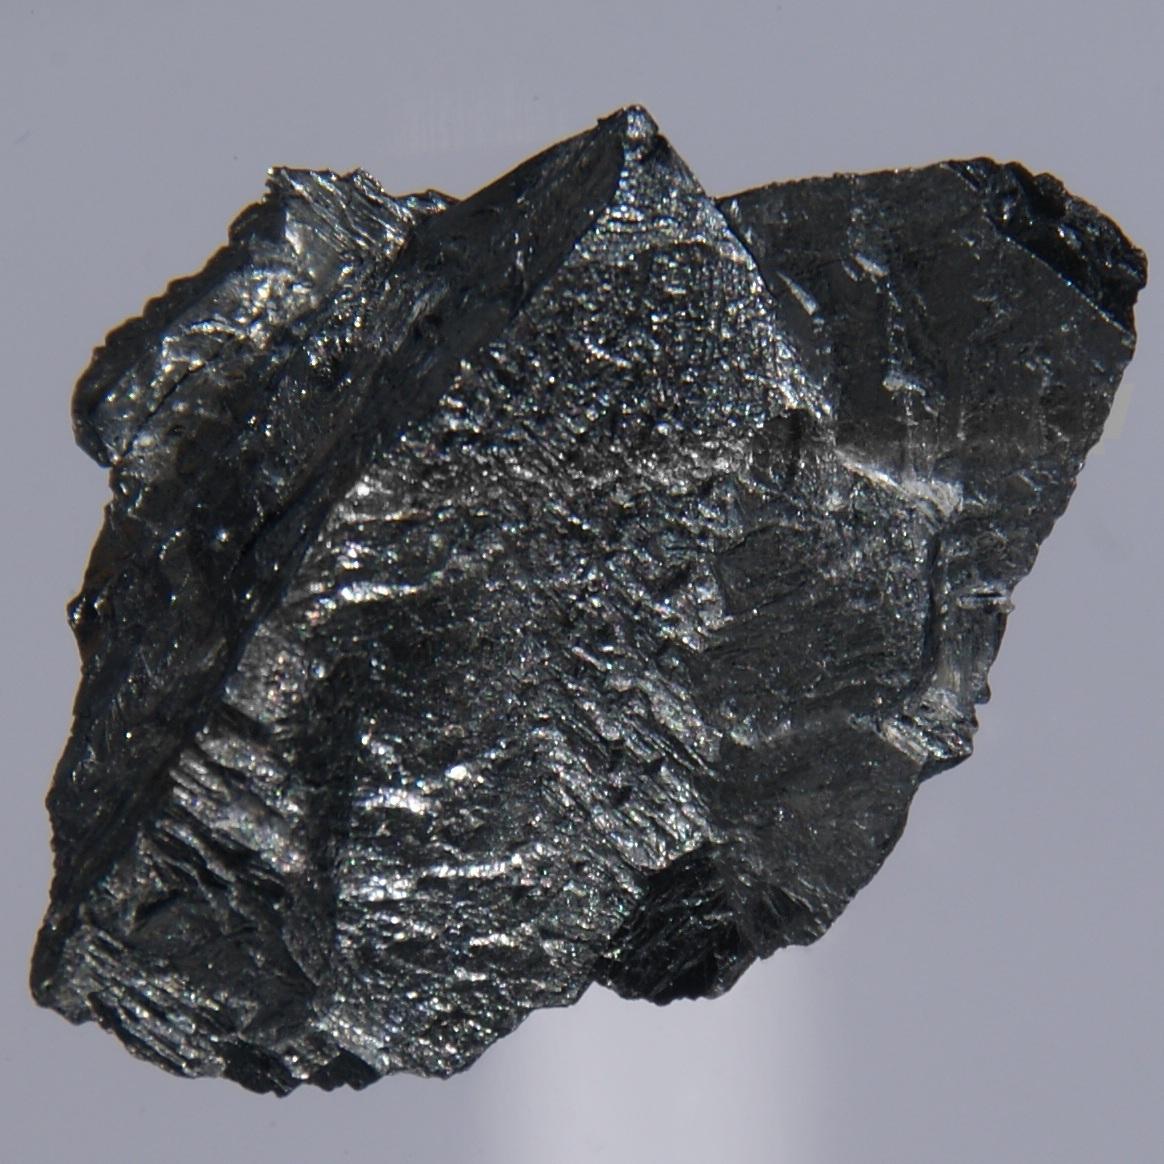 Chemical Elements - Chromium